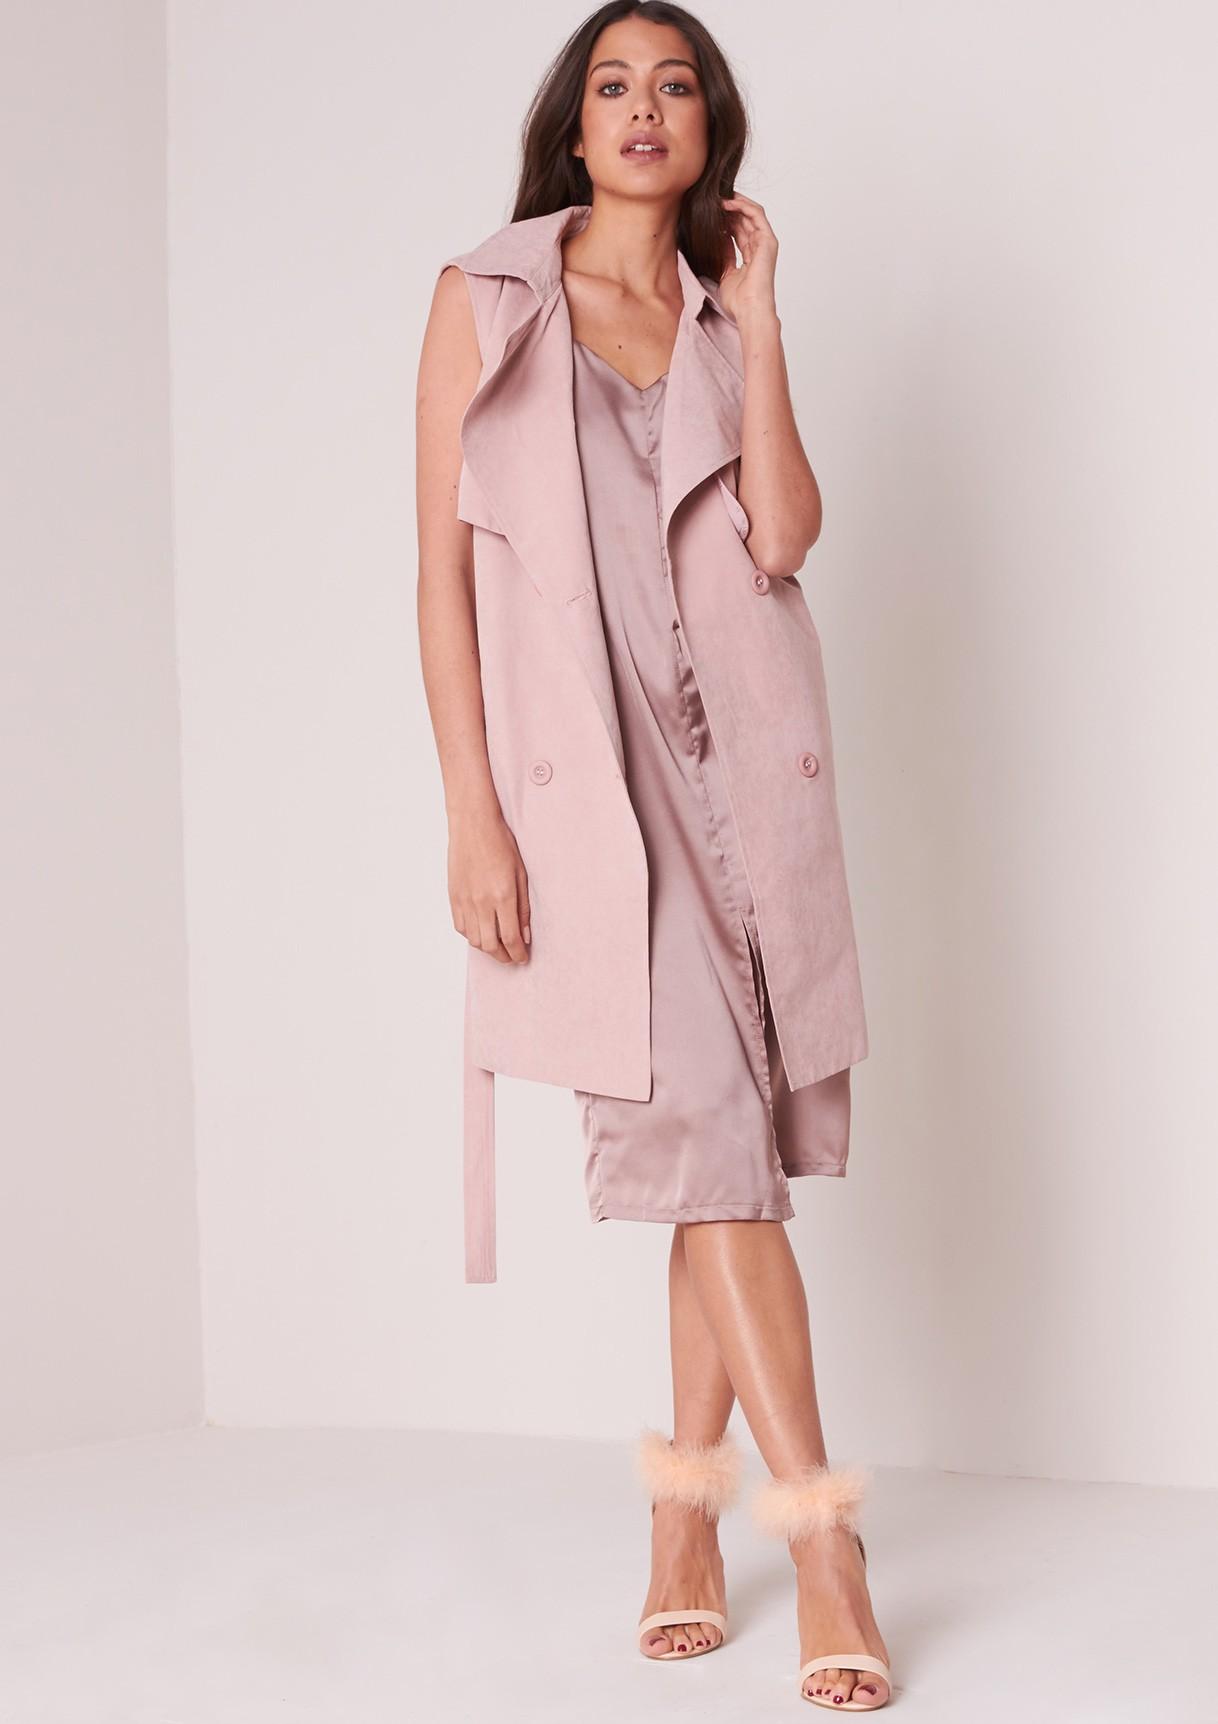 Sheer Duster Jacket   Womens Trench Coat Sale   Sleeveless Trench Coat